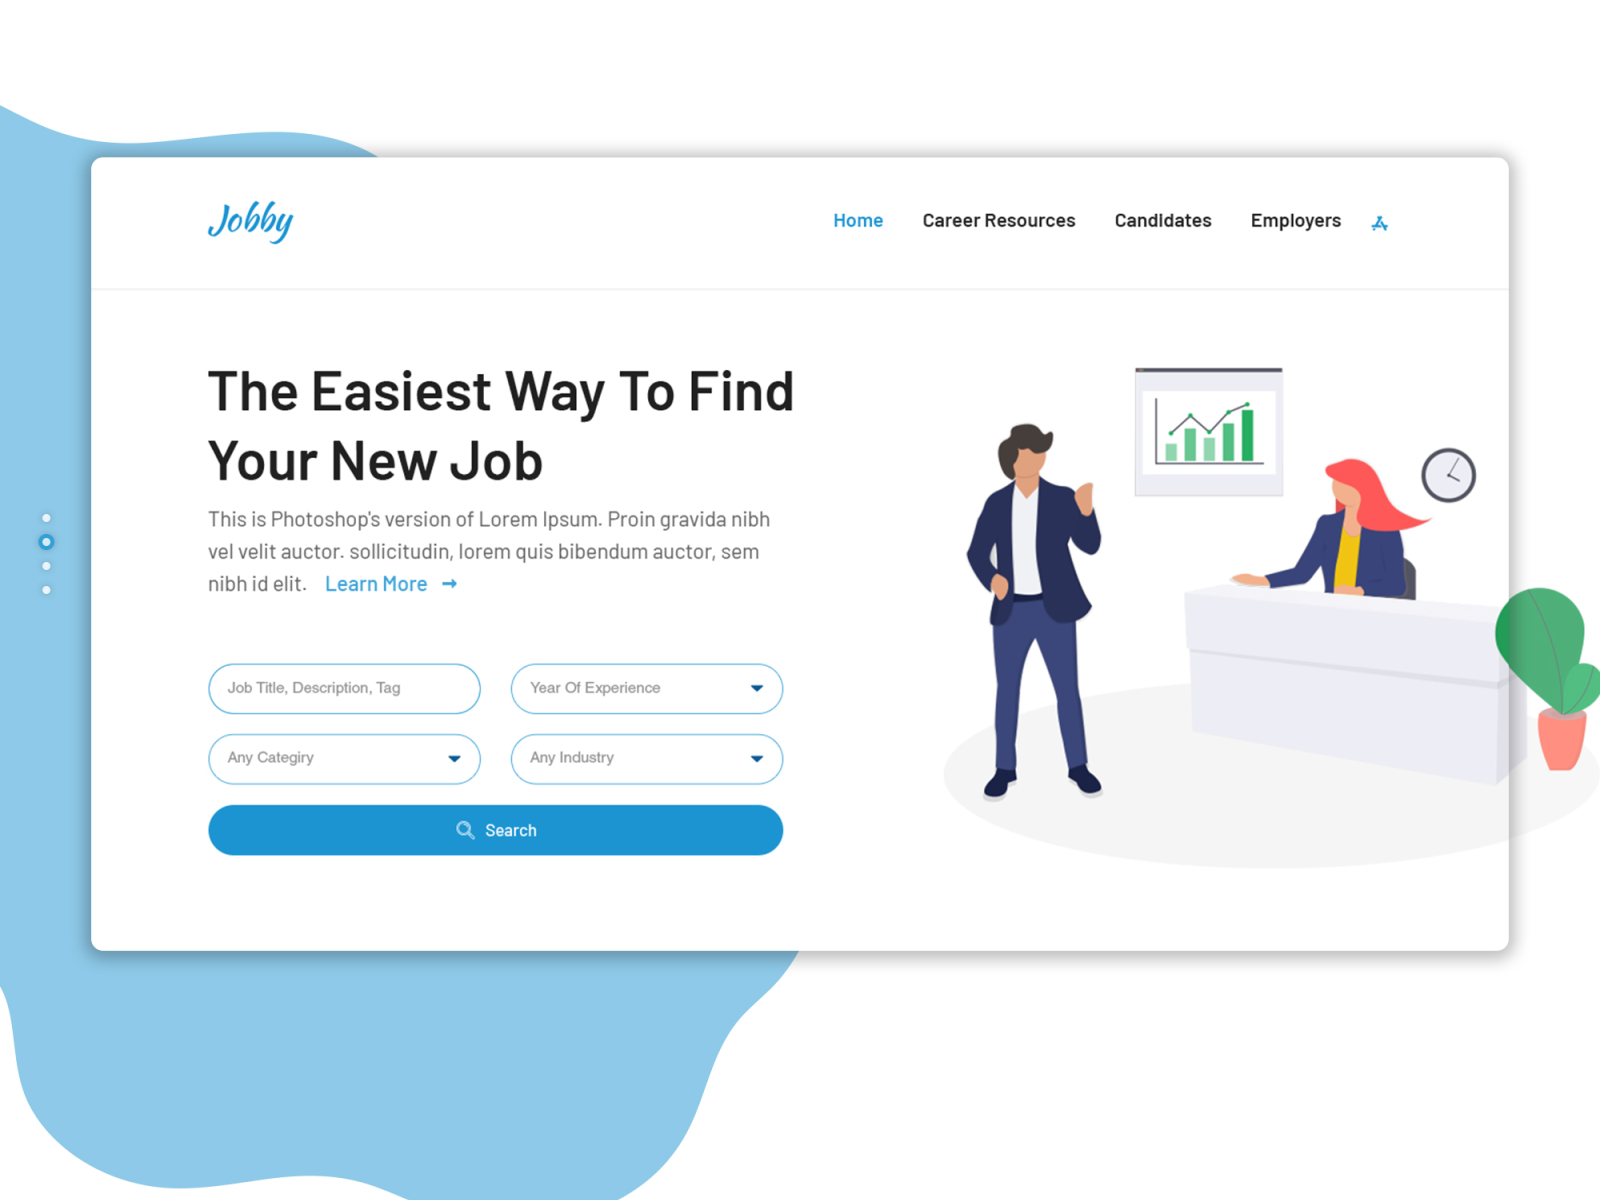 Job Portal Web Landing Page Ui Ux Design By Yasin Arafat Rasel On Dribbble